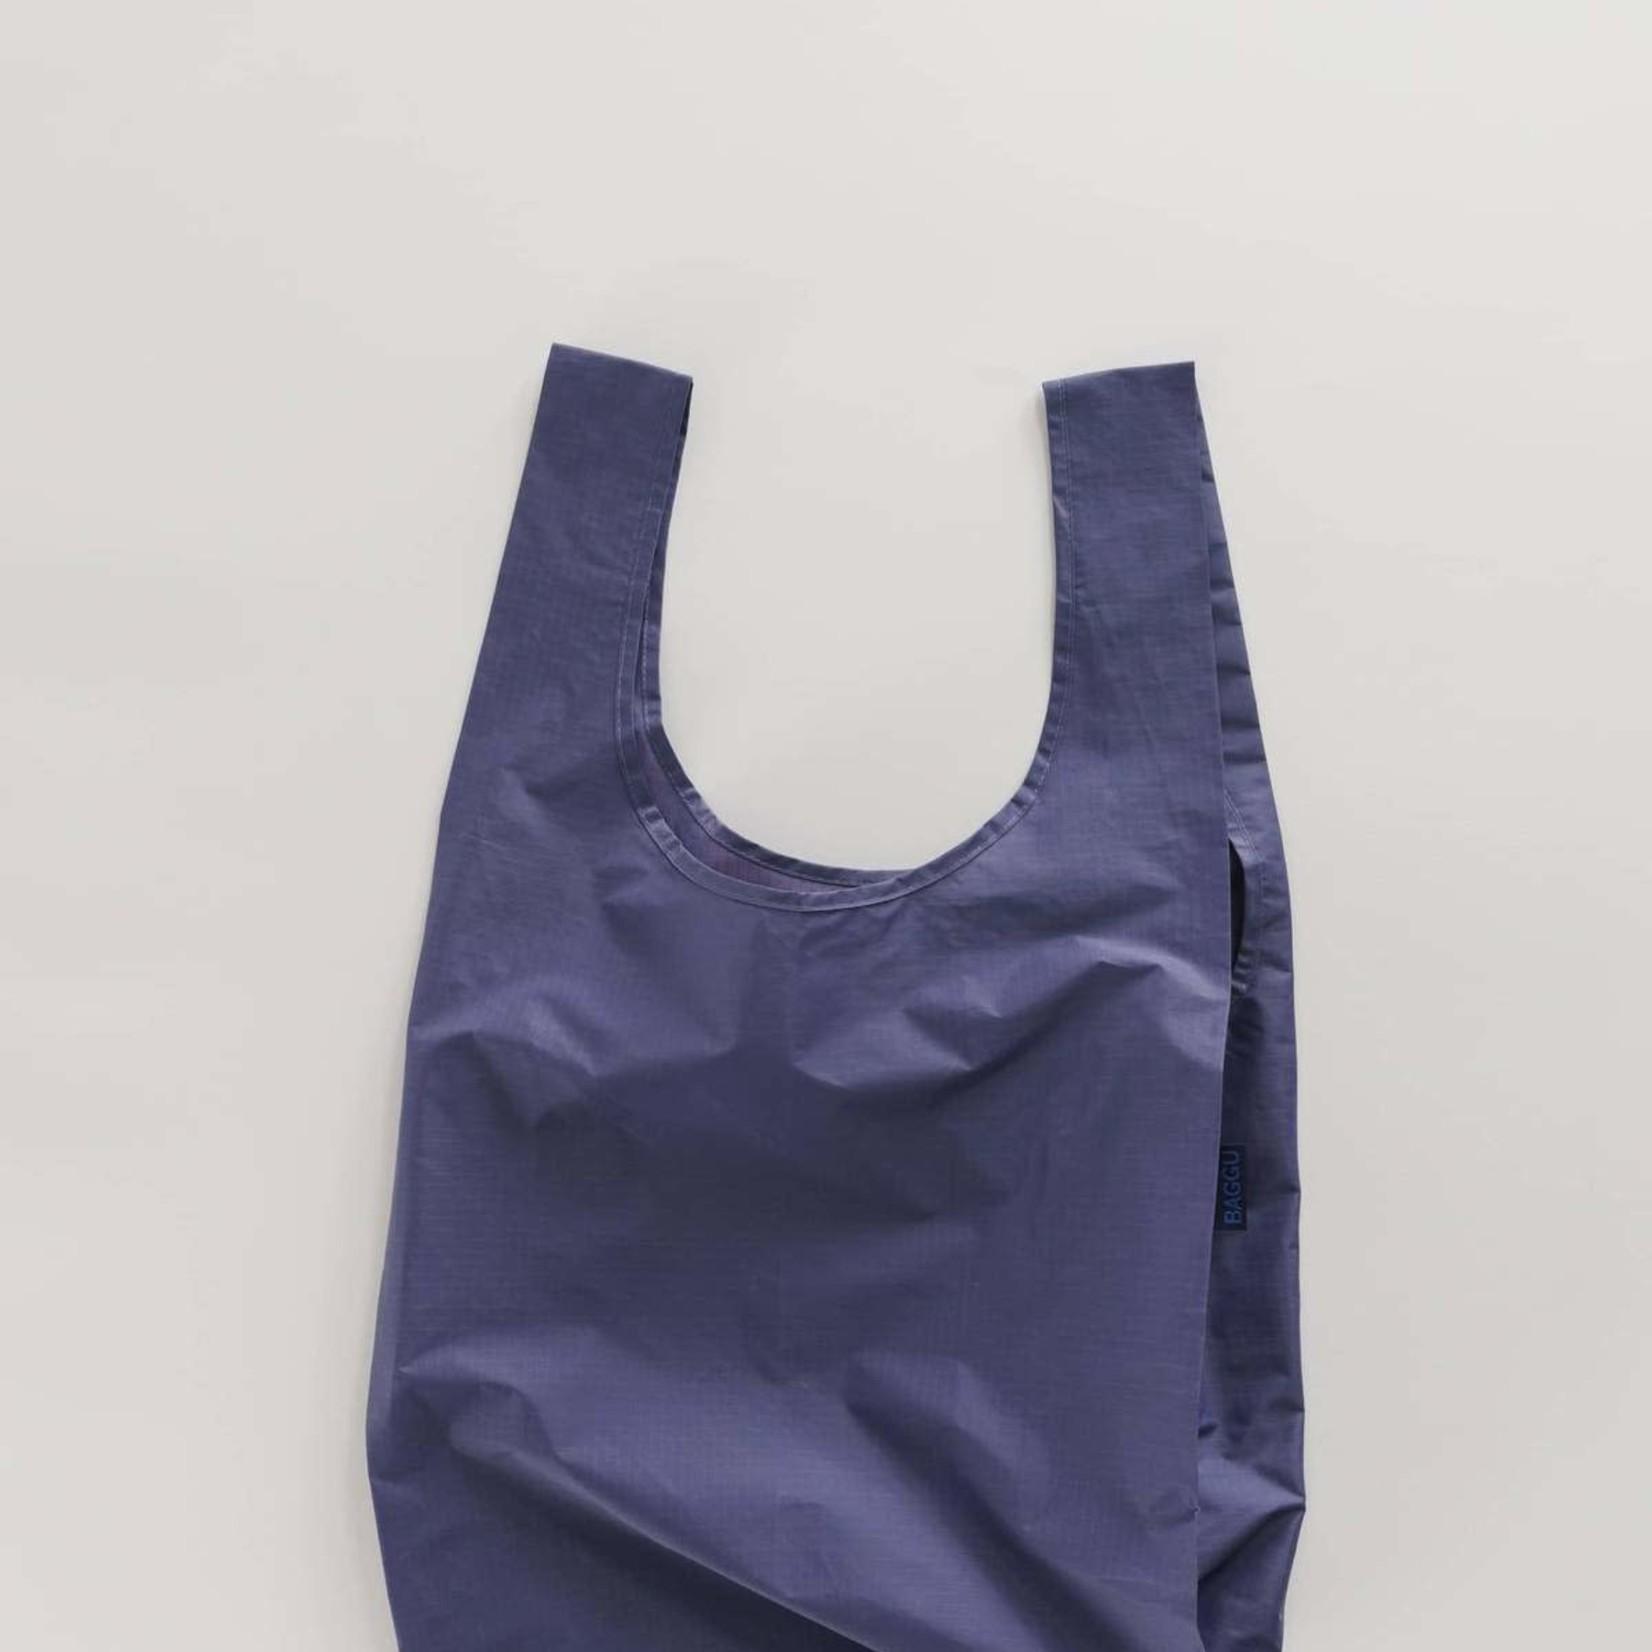 Baggu Baggu Reusable Bag Standard Solid Ink